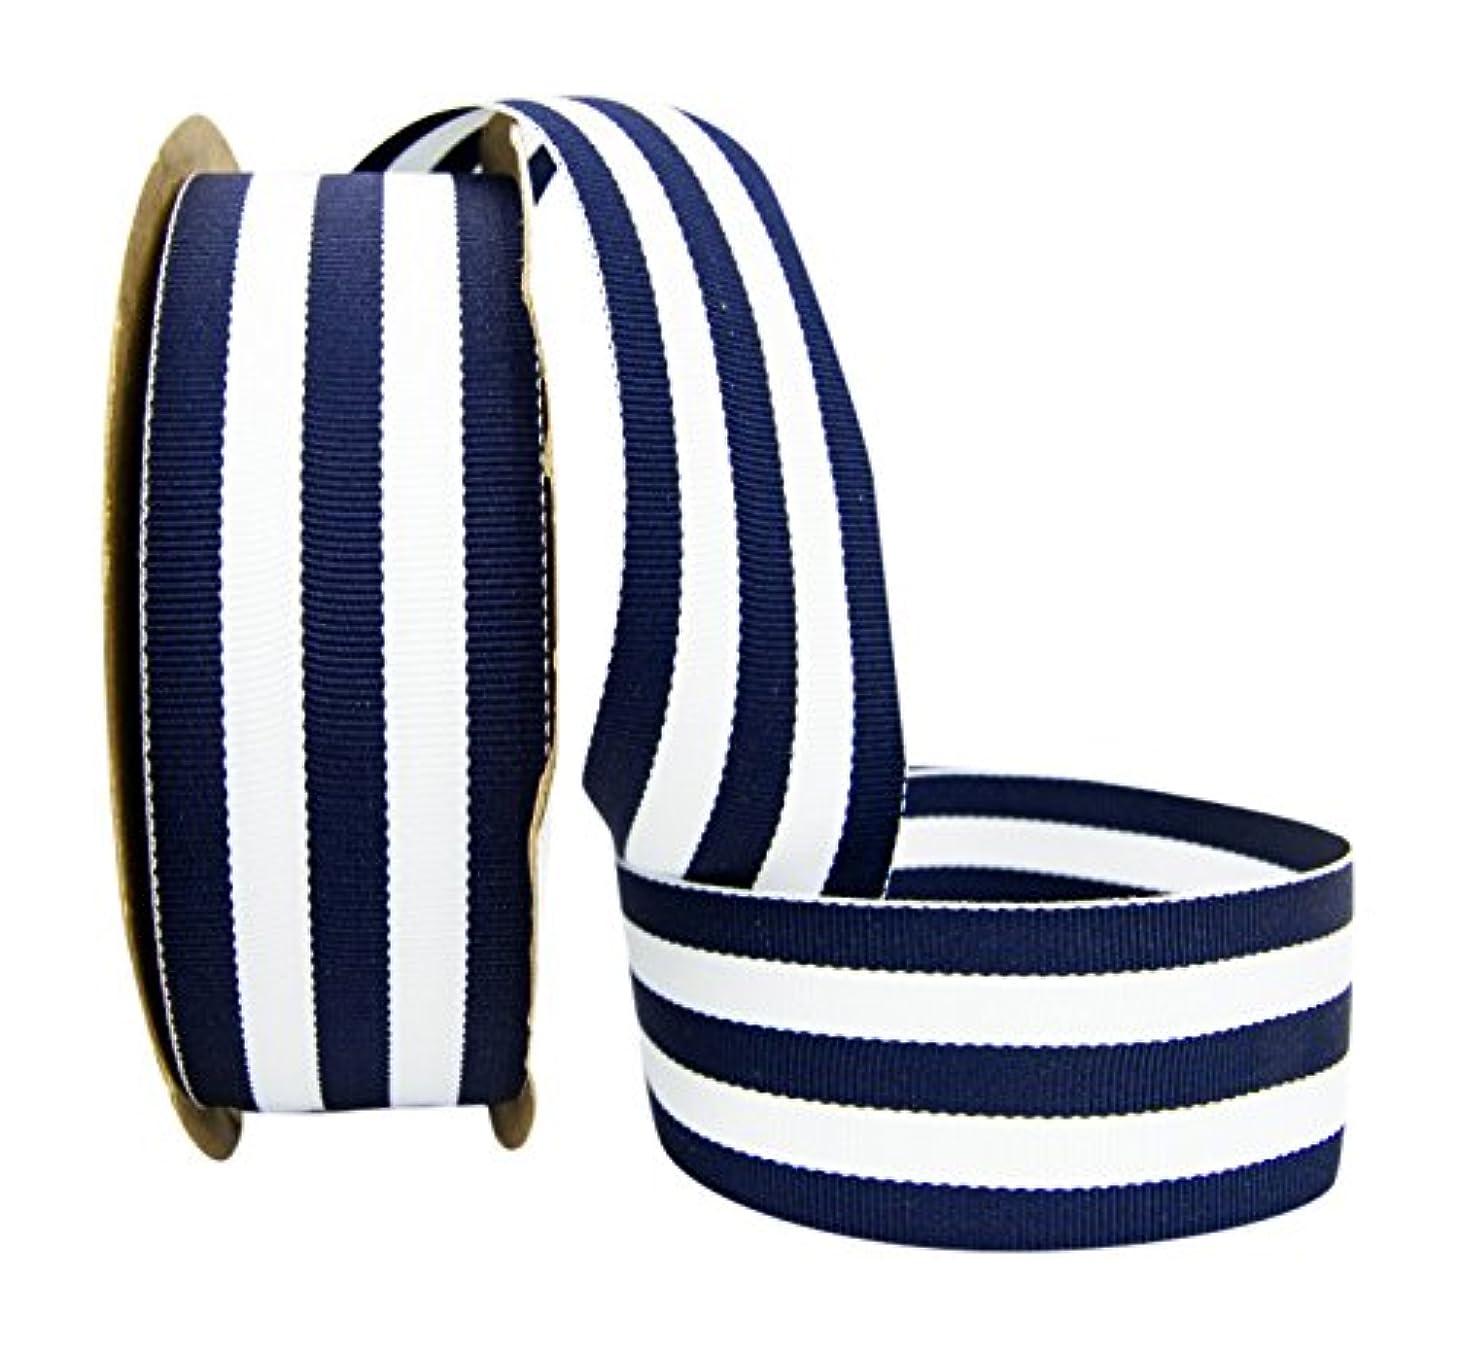 Ribbon Bazaar Grosgrain Mono Stripes 1-1/2 inch Navy 20 Yards 100% Polyester Ribbon